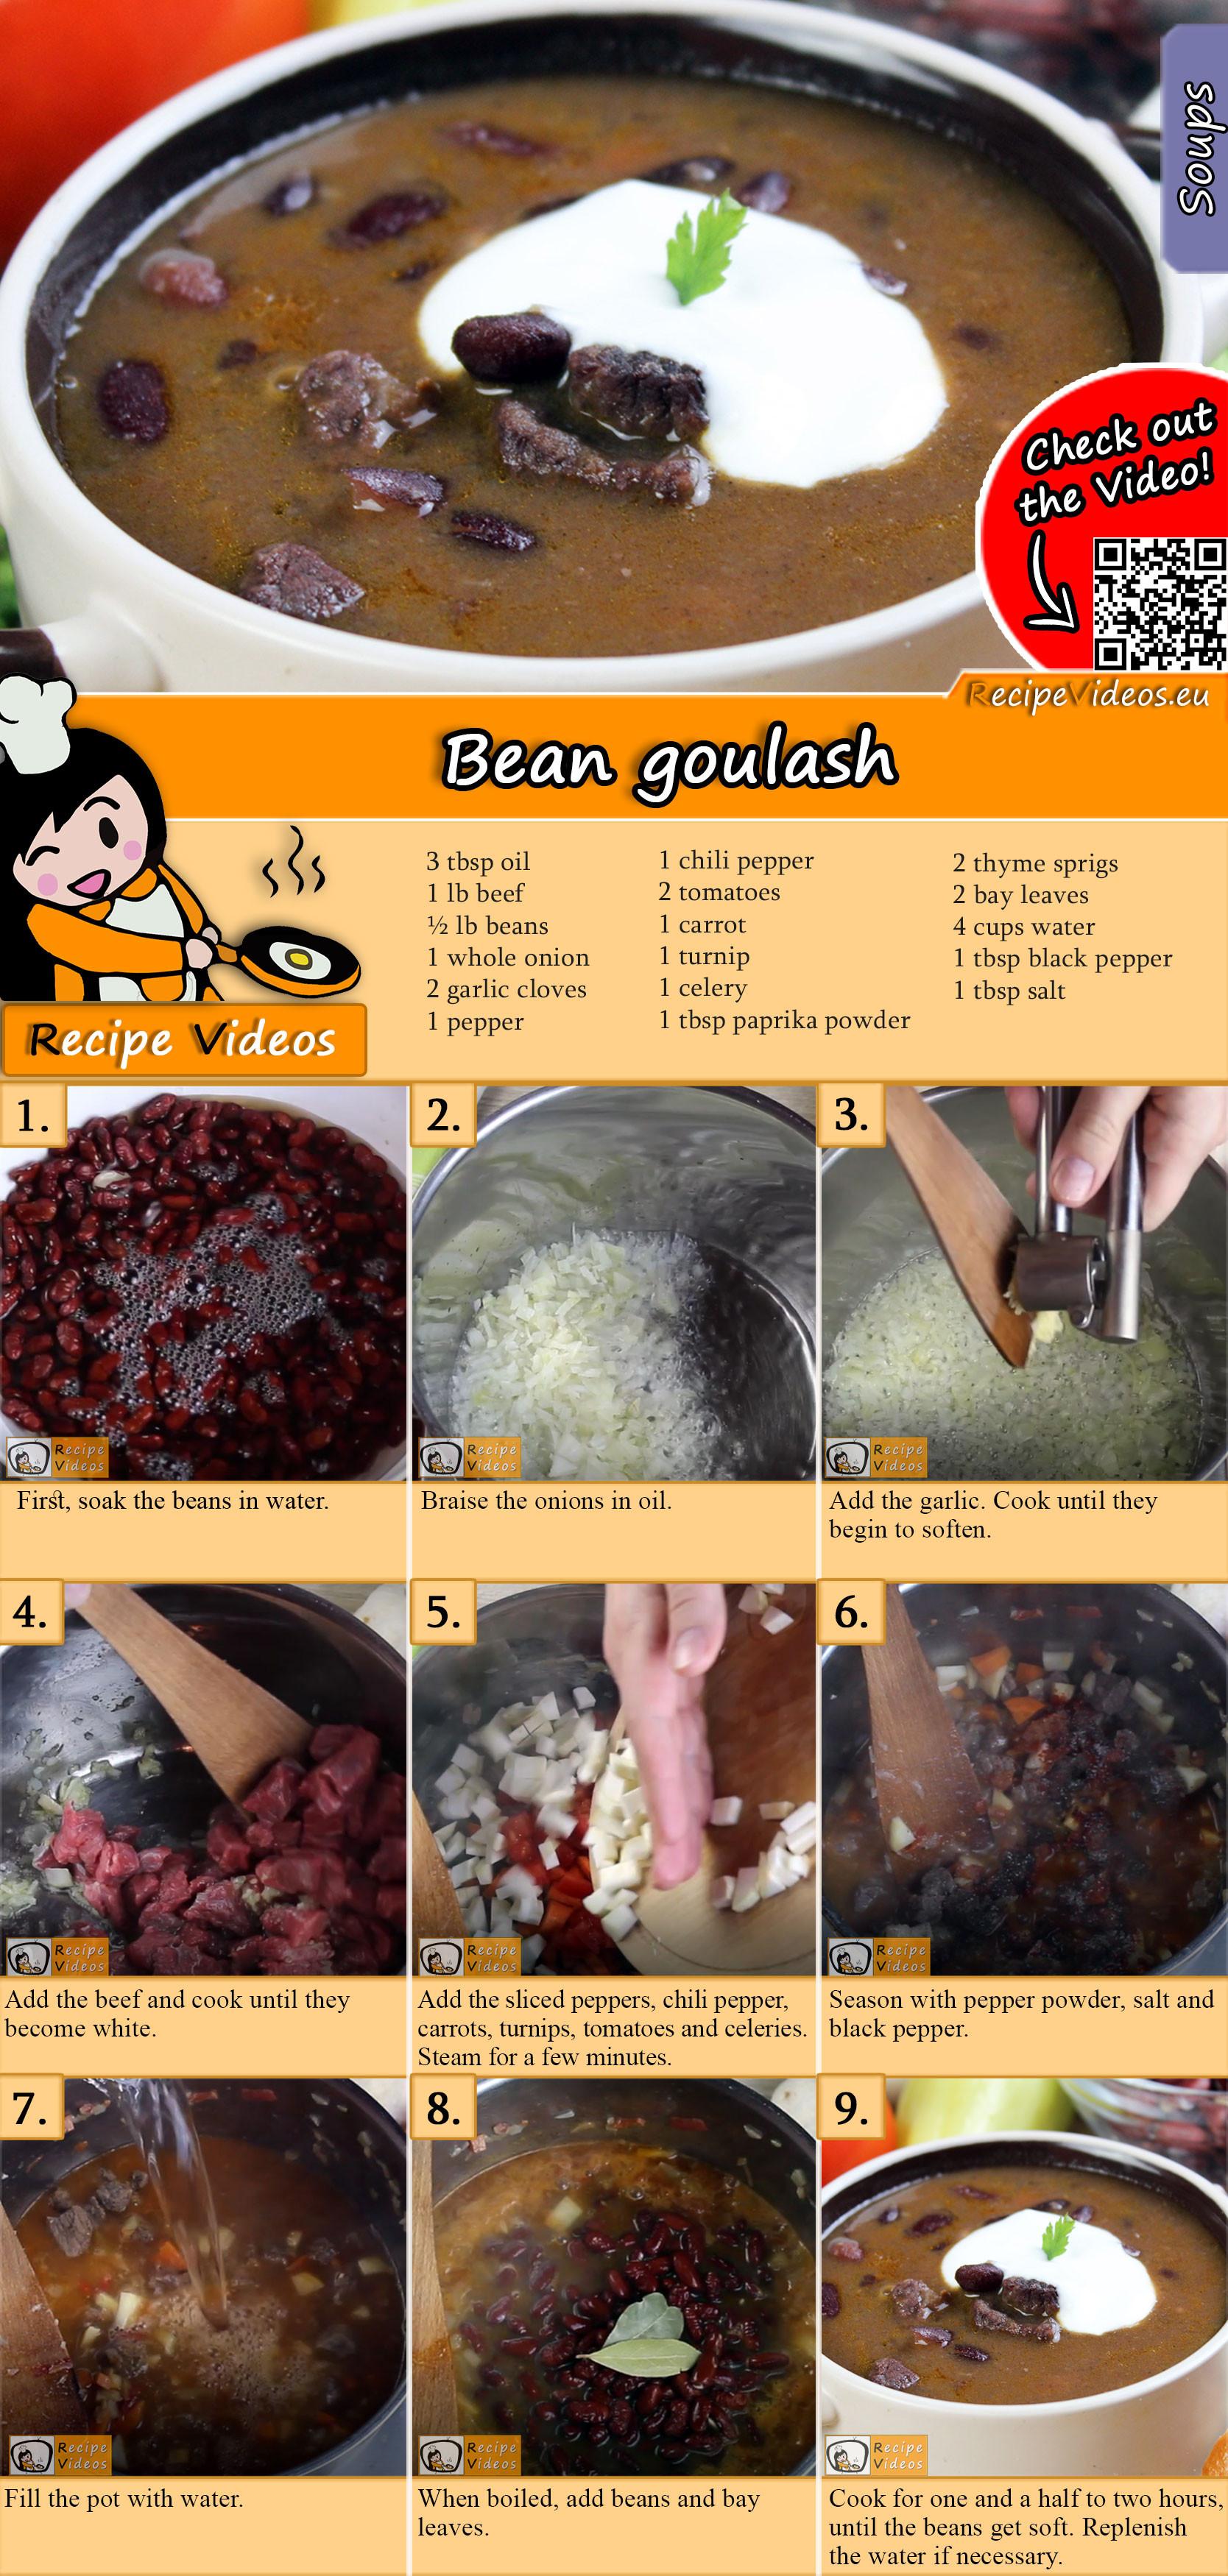 Bean goulash recipe with video